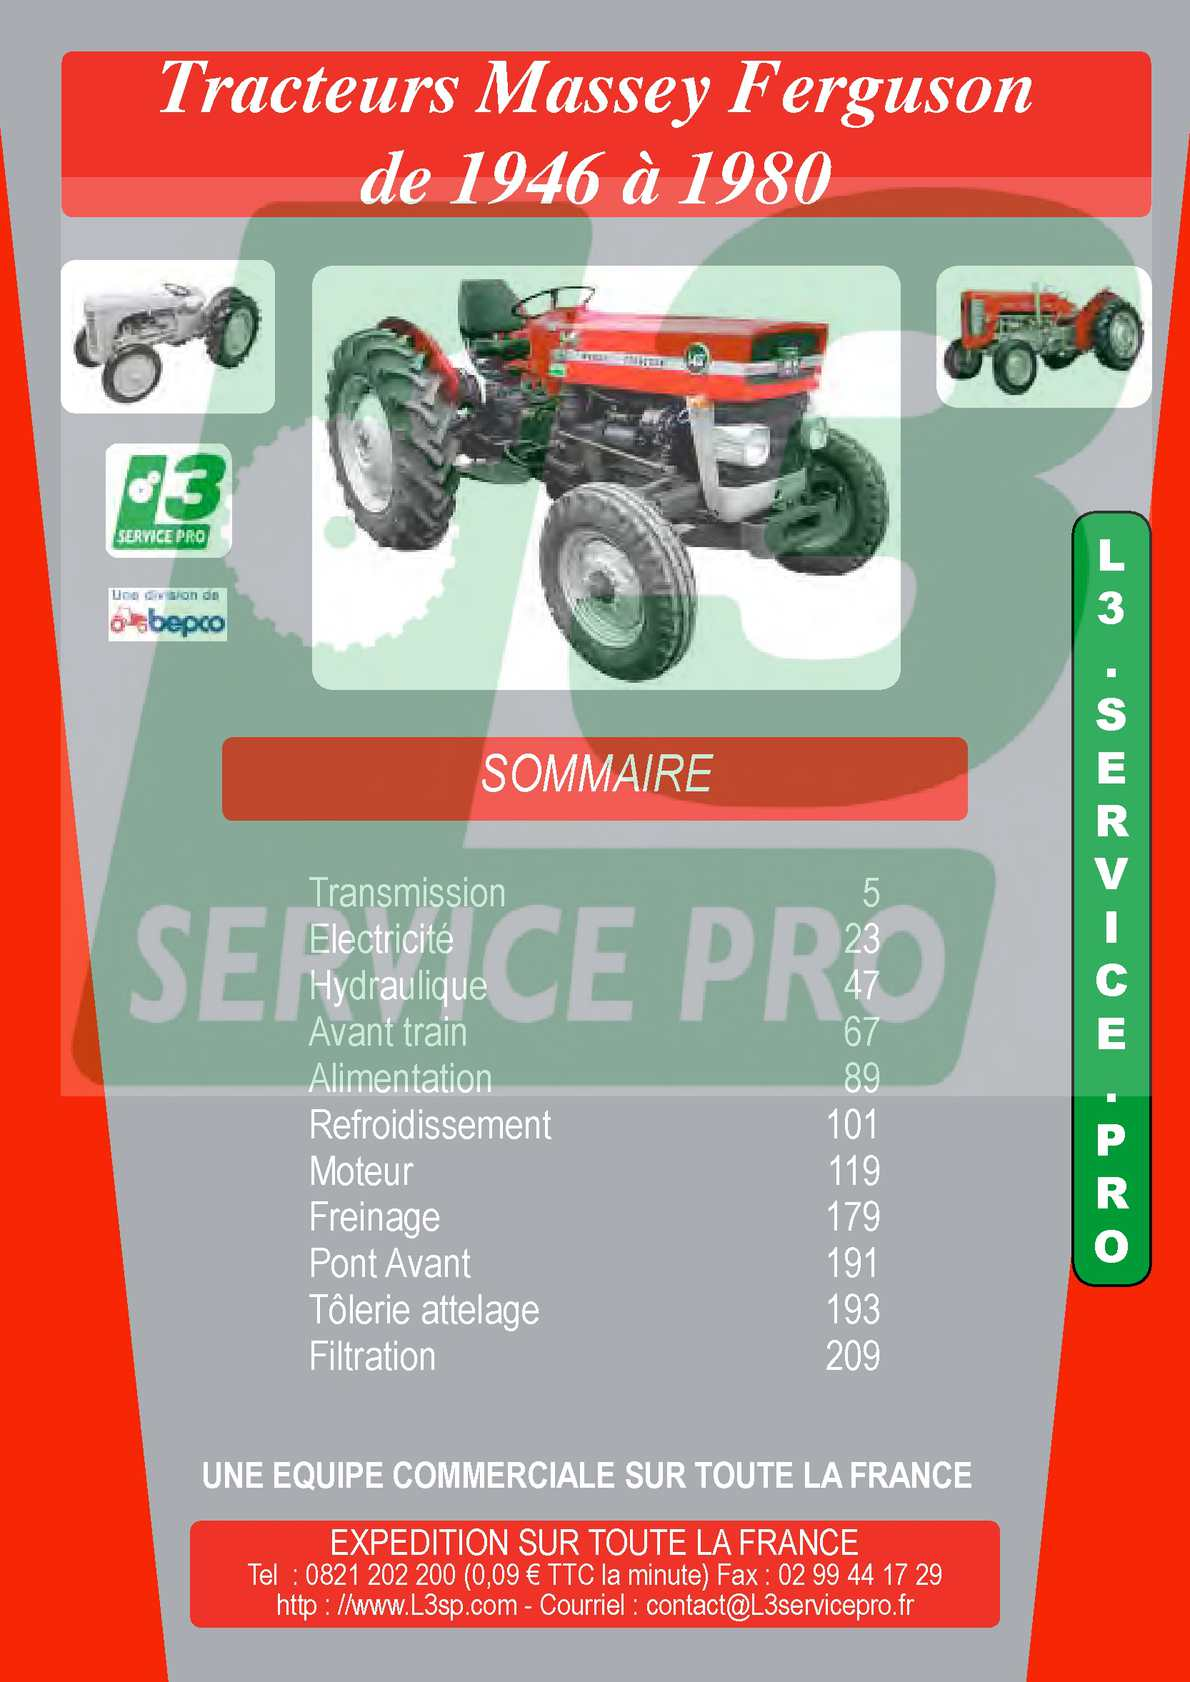 Tracteur Massey Ferguson 820 825 830 Bougie de Préchauffage